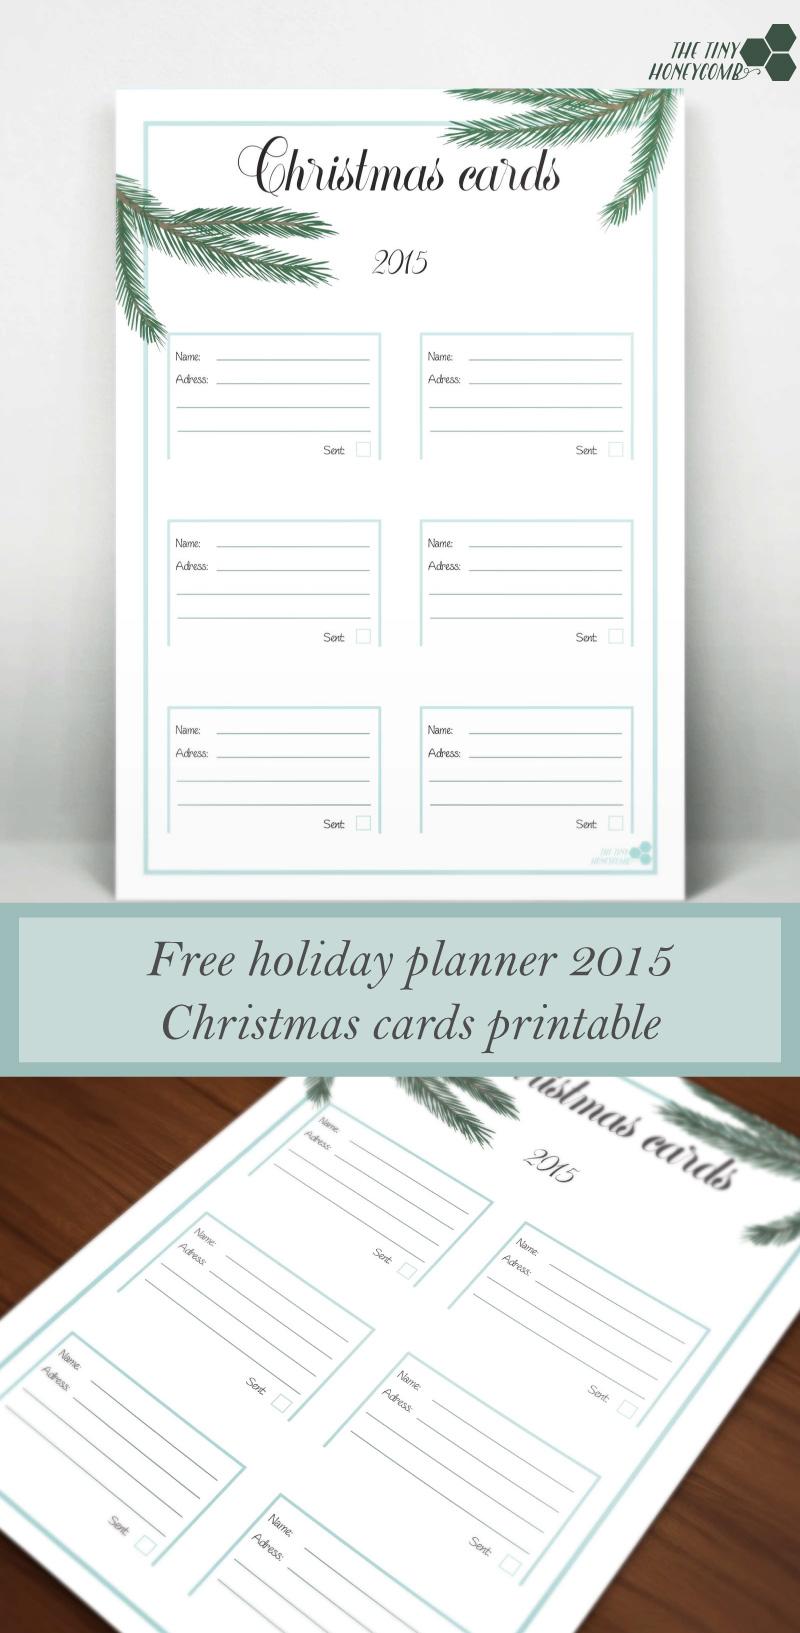 Christmas planner 2015. Free printables - Christmas cards. Getting organized this christmas.